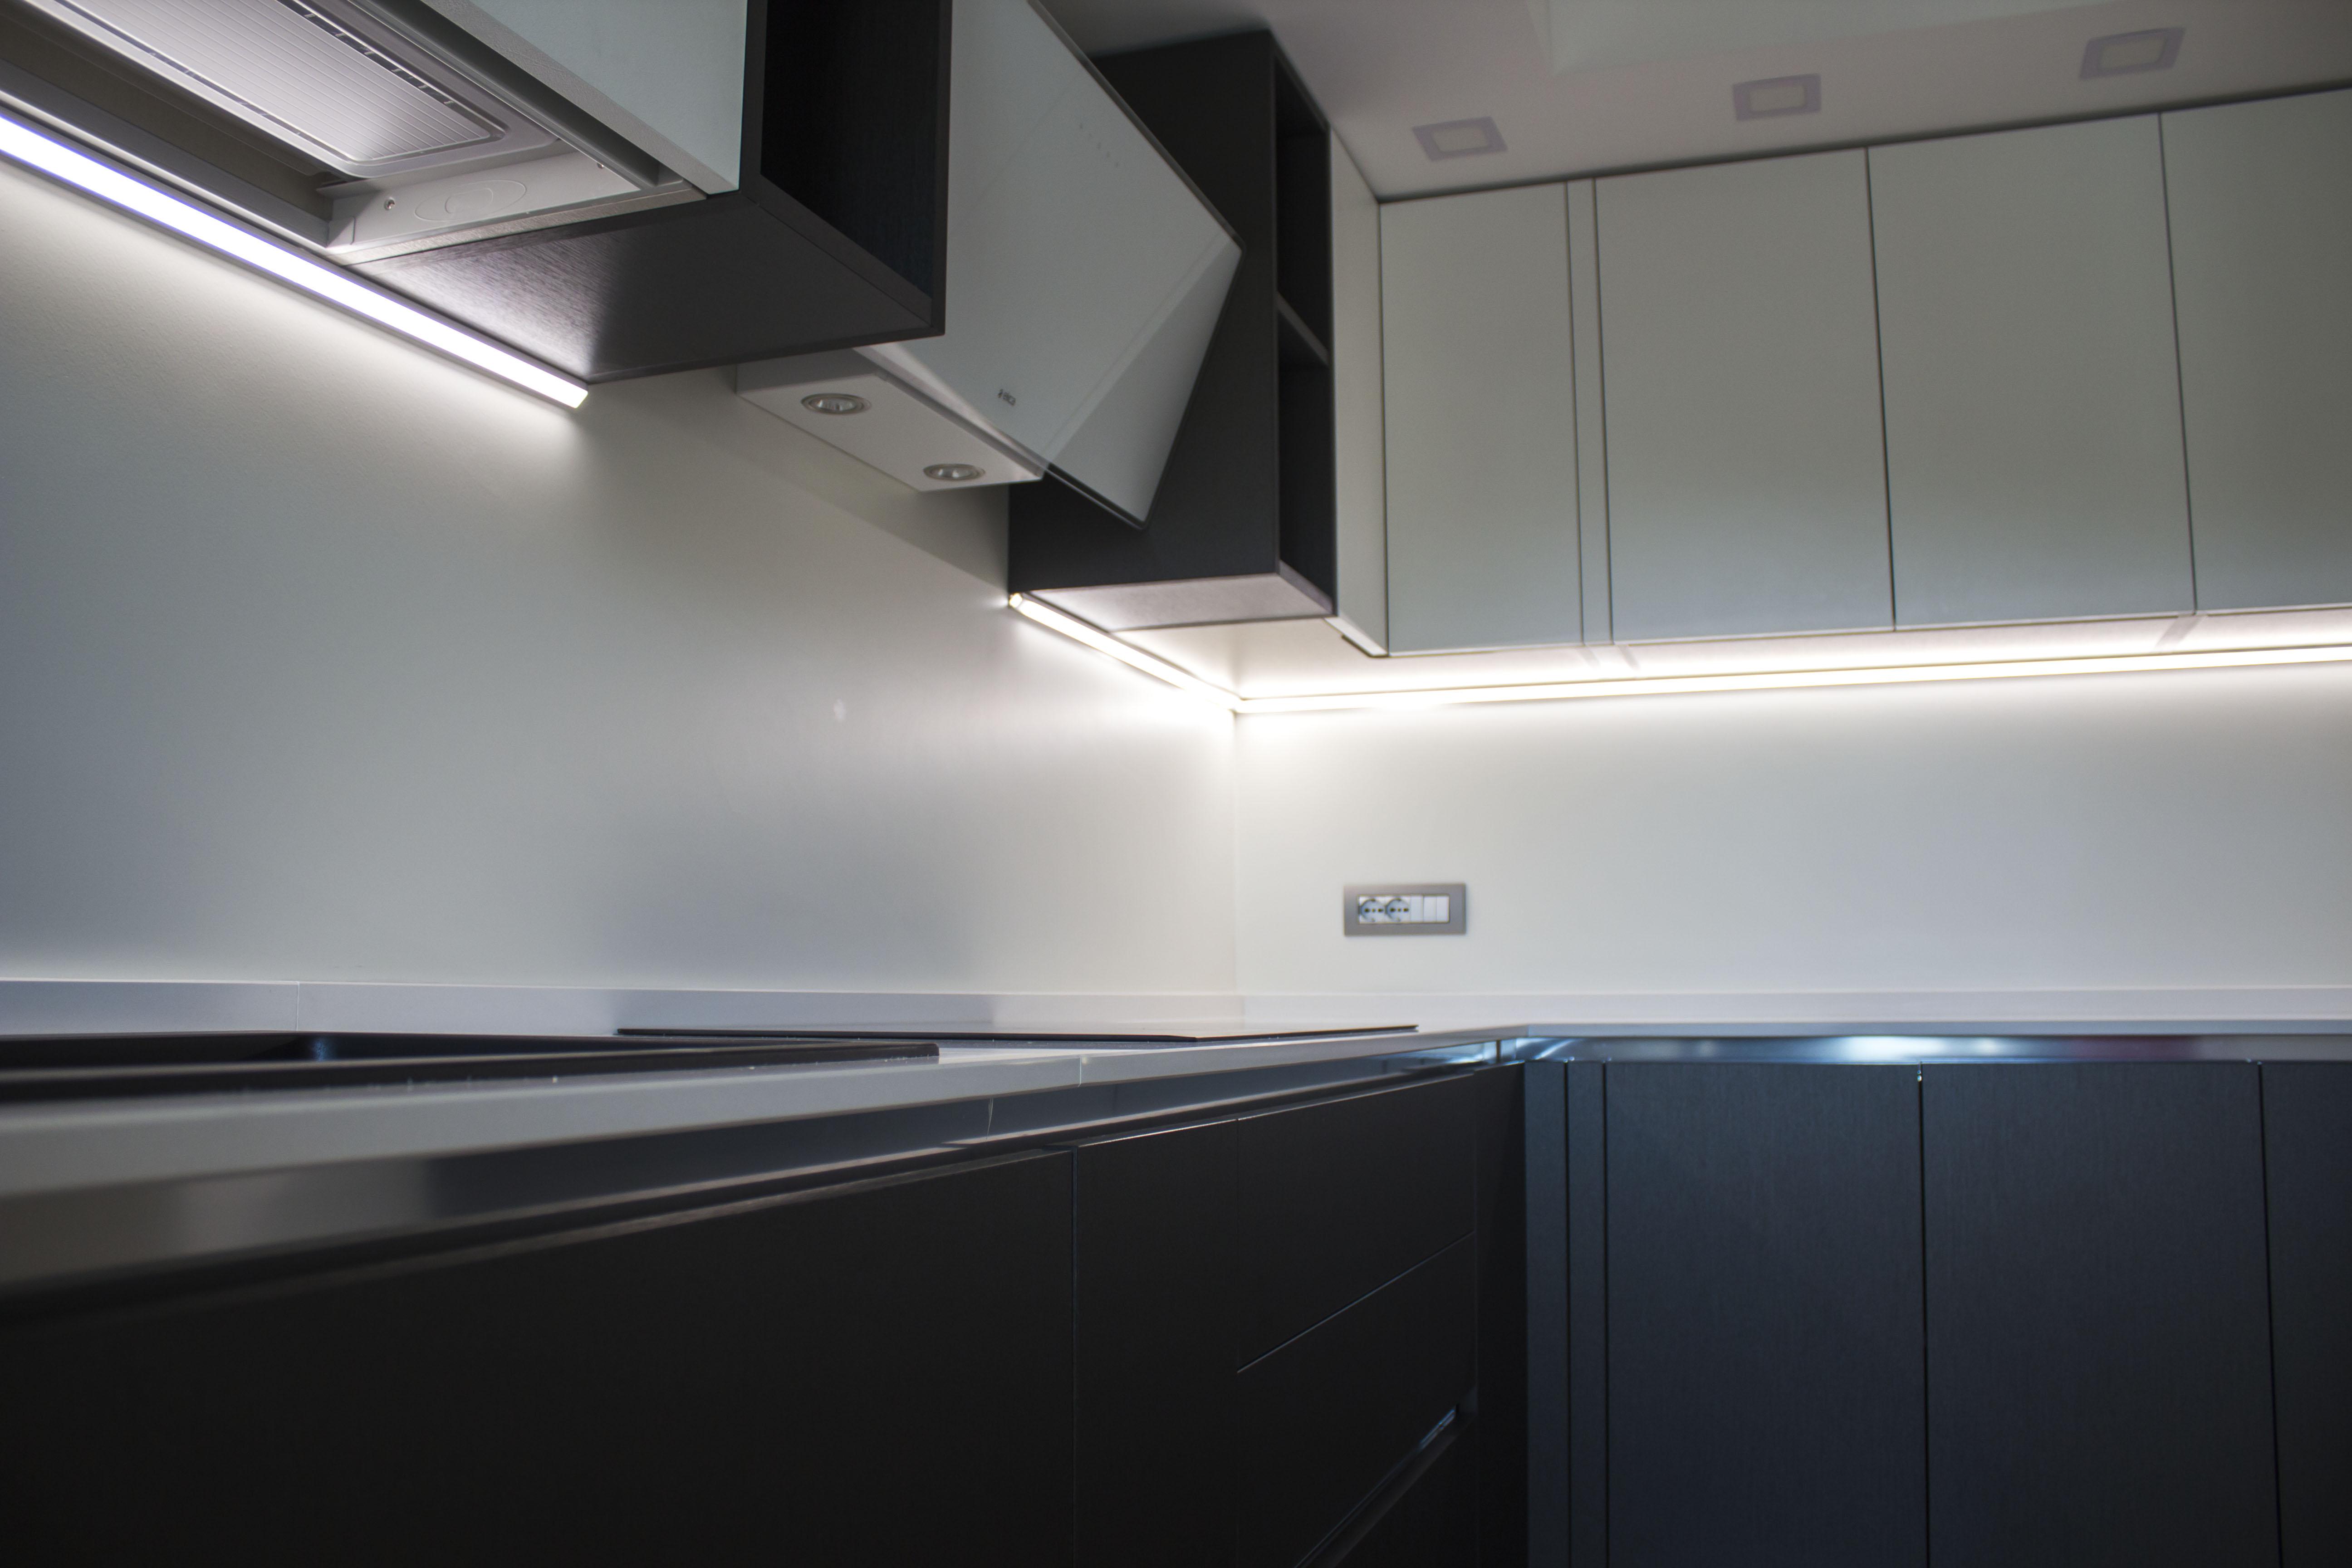 Una resina per rivestimento: originalità e raffinatezza in cucina